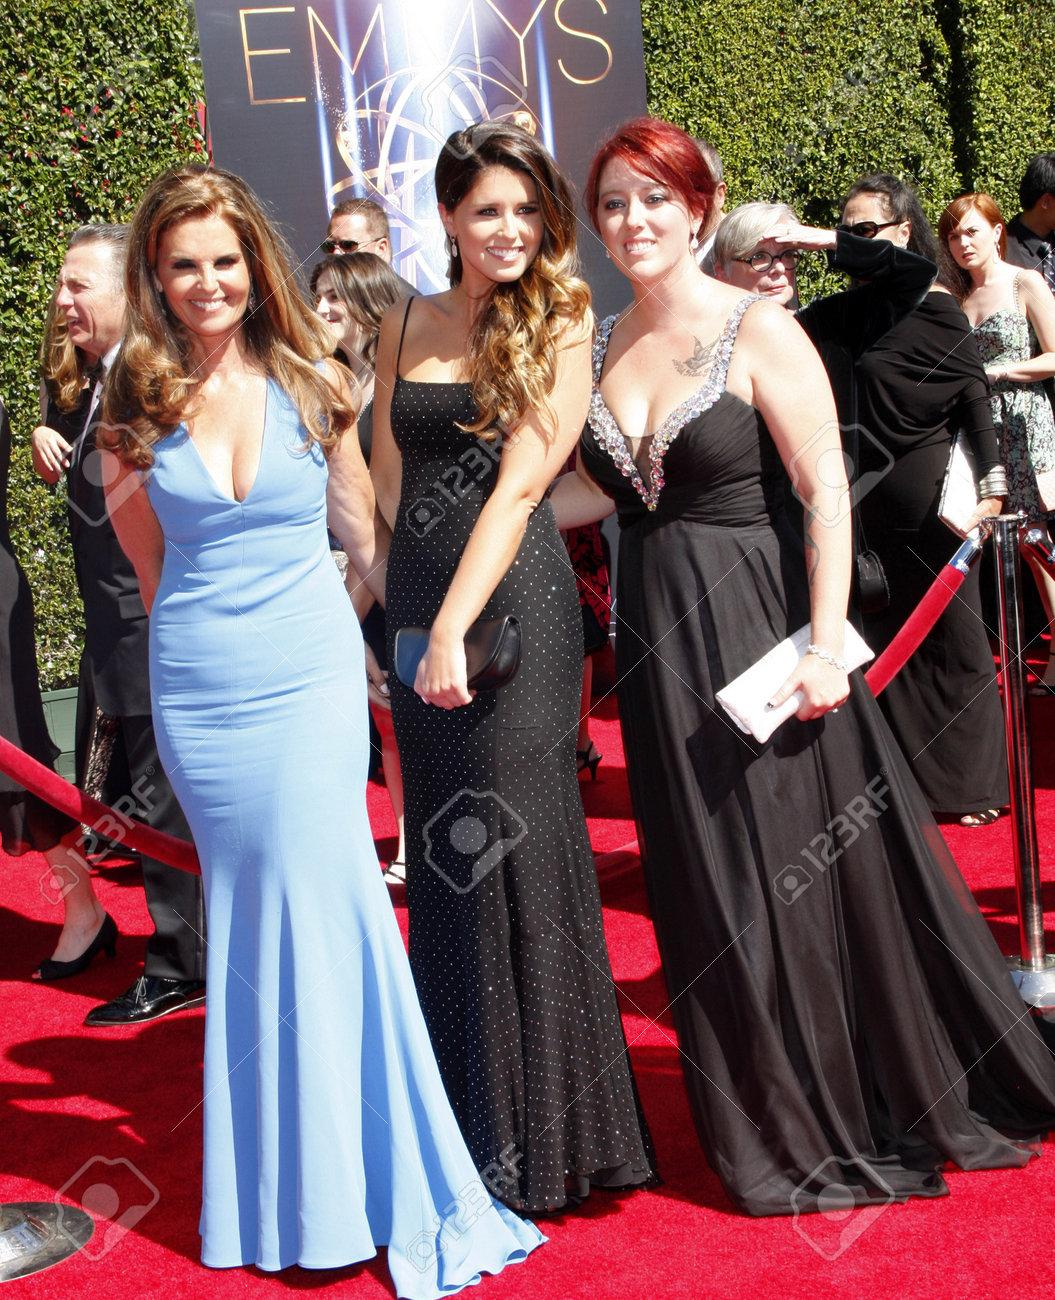 Maria Shriver, Christina Schwarzenegger and Katherine Schwarzenegger